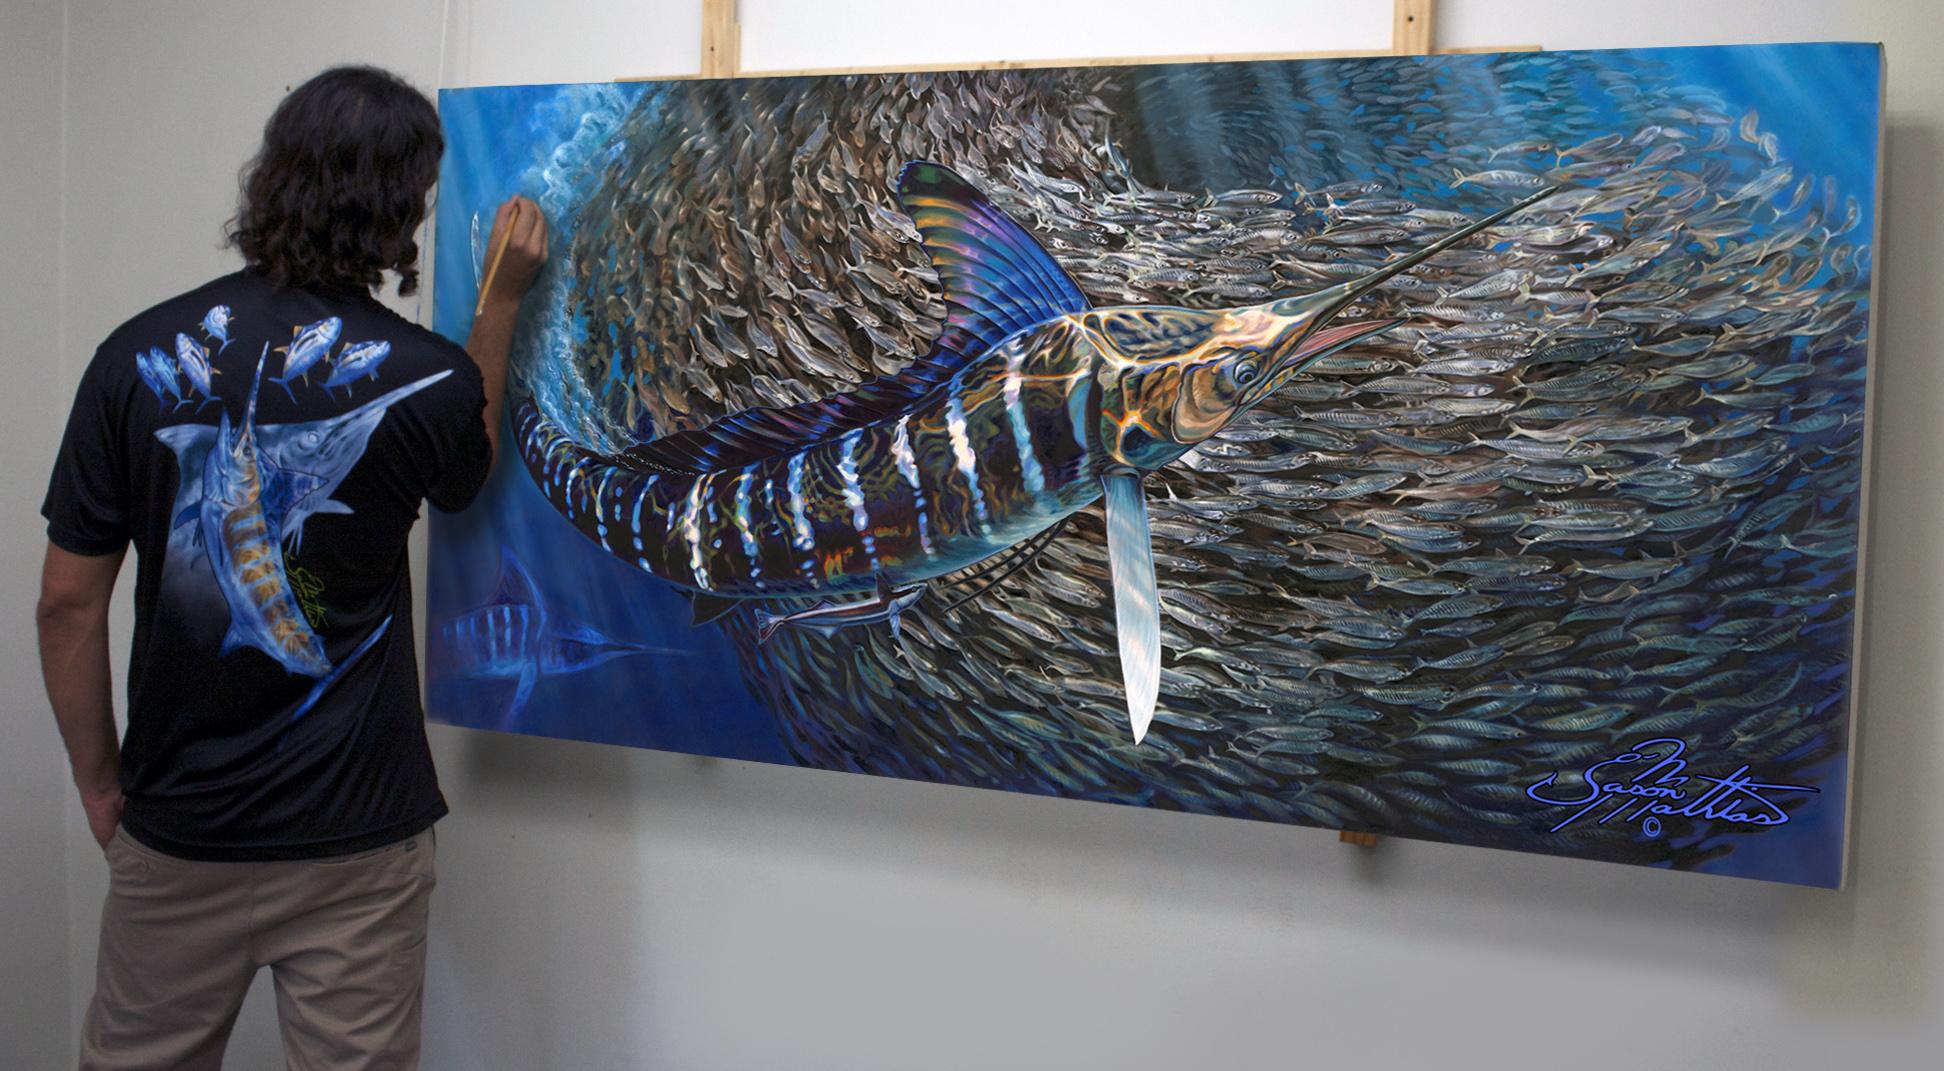 jason-mathias-painting-striped-marlin.jpg